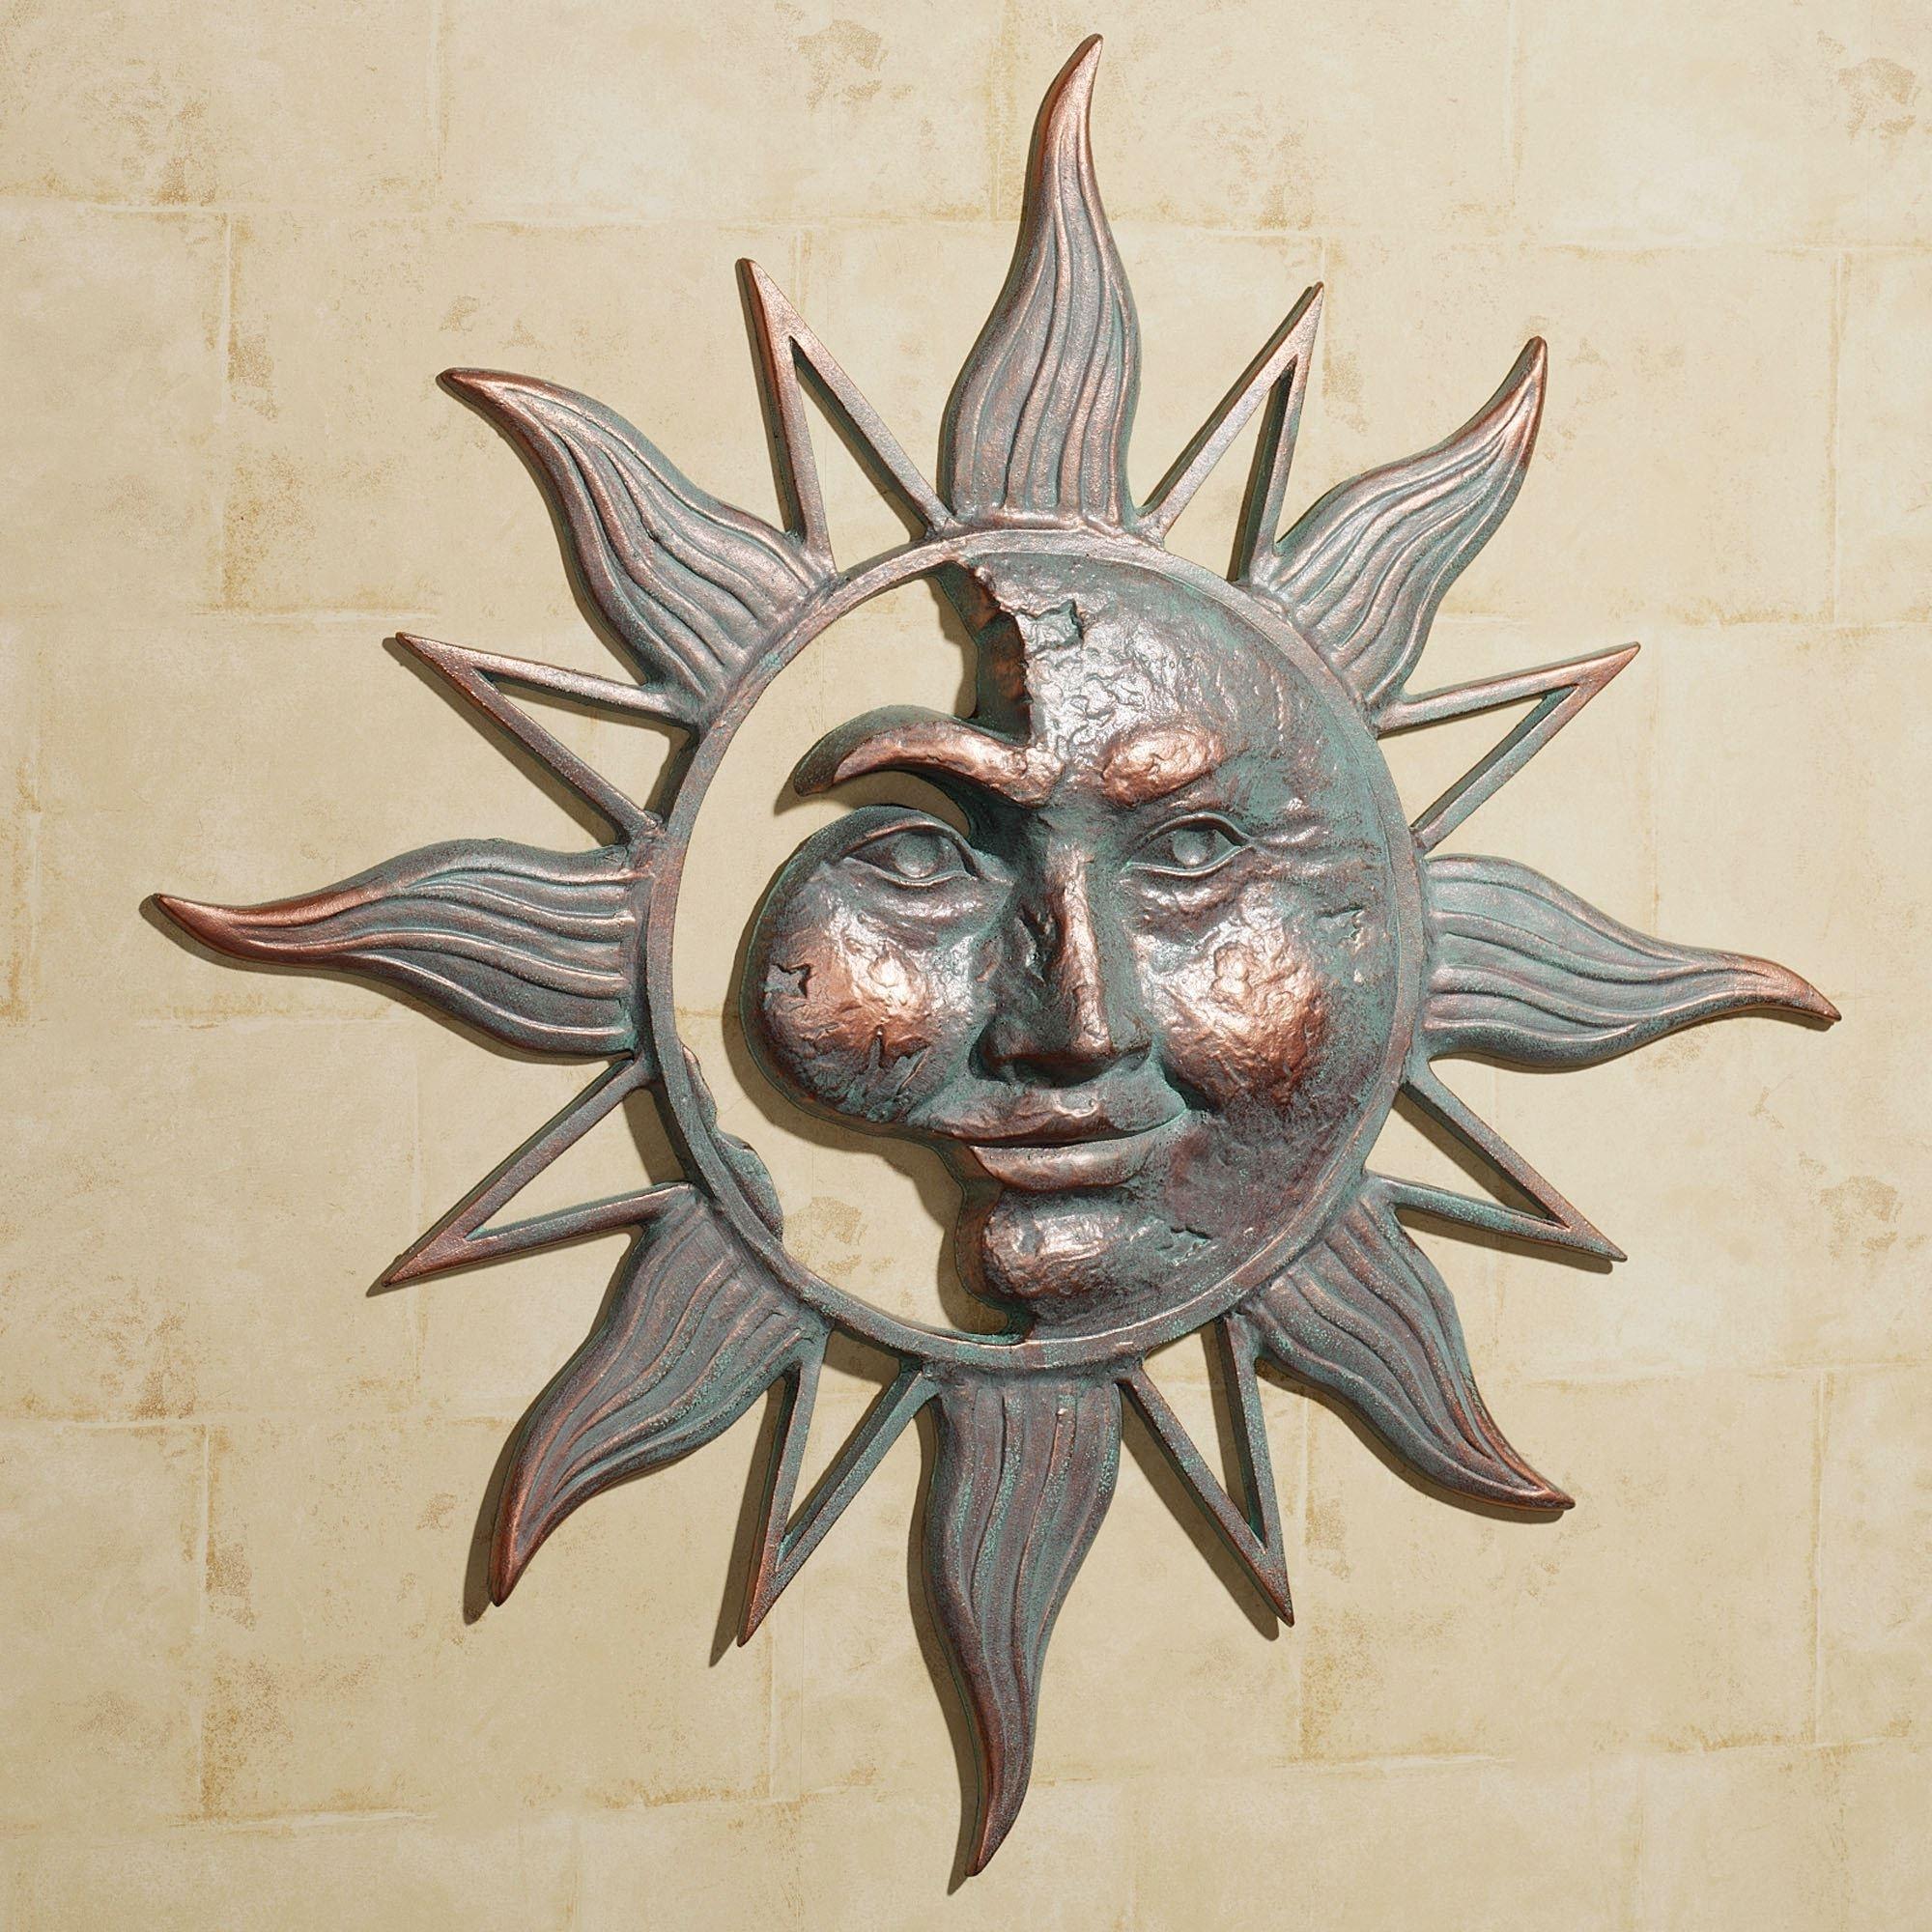 Half Face Sun Indoor Outdoor Metal Wall Art Within Most Recent Outdoor Sun Wall Art (View 5 of 15)